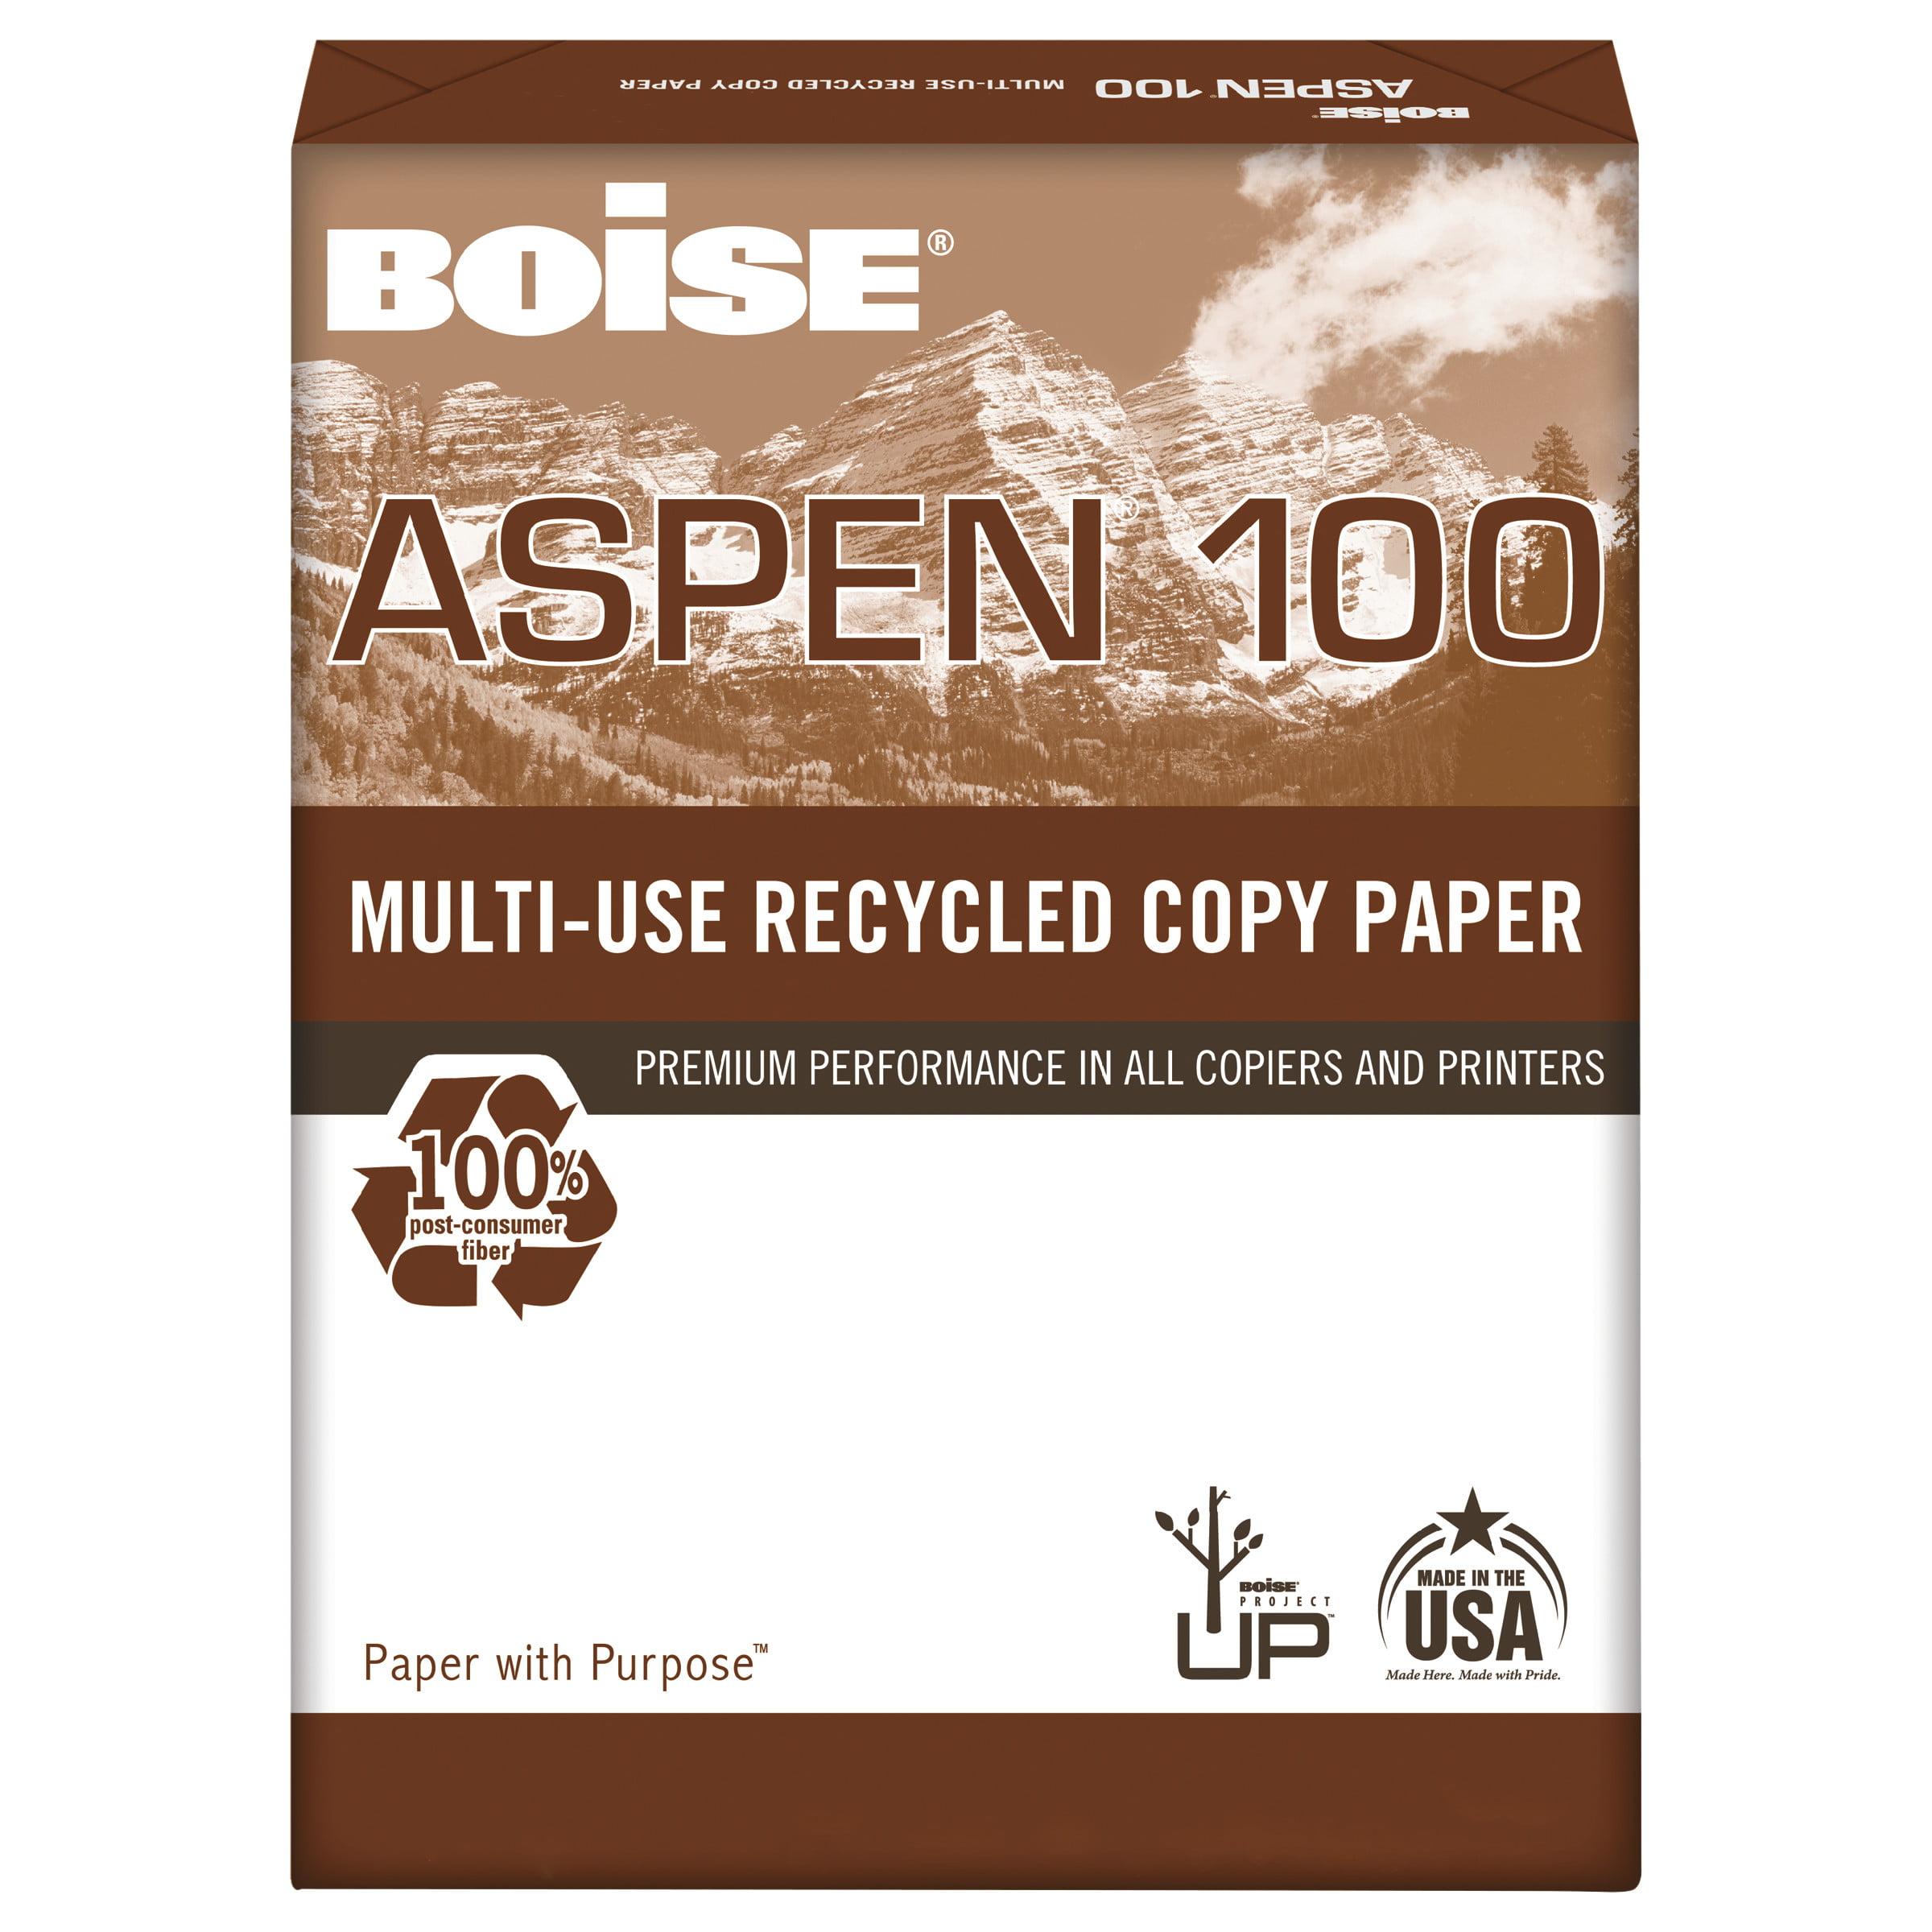 Boise ASPEN 100% Multi-Use Recycled Paper, 92 Bright, 20lb, 8-1/2 x 11, White